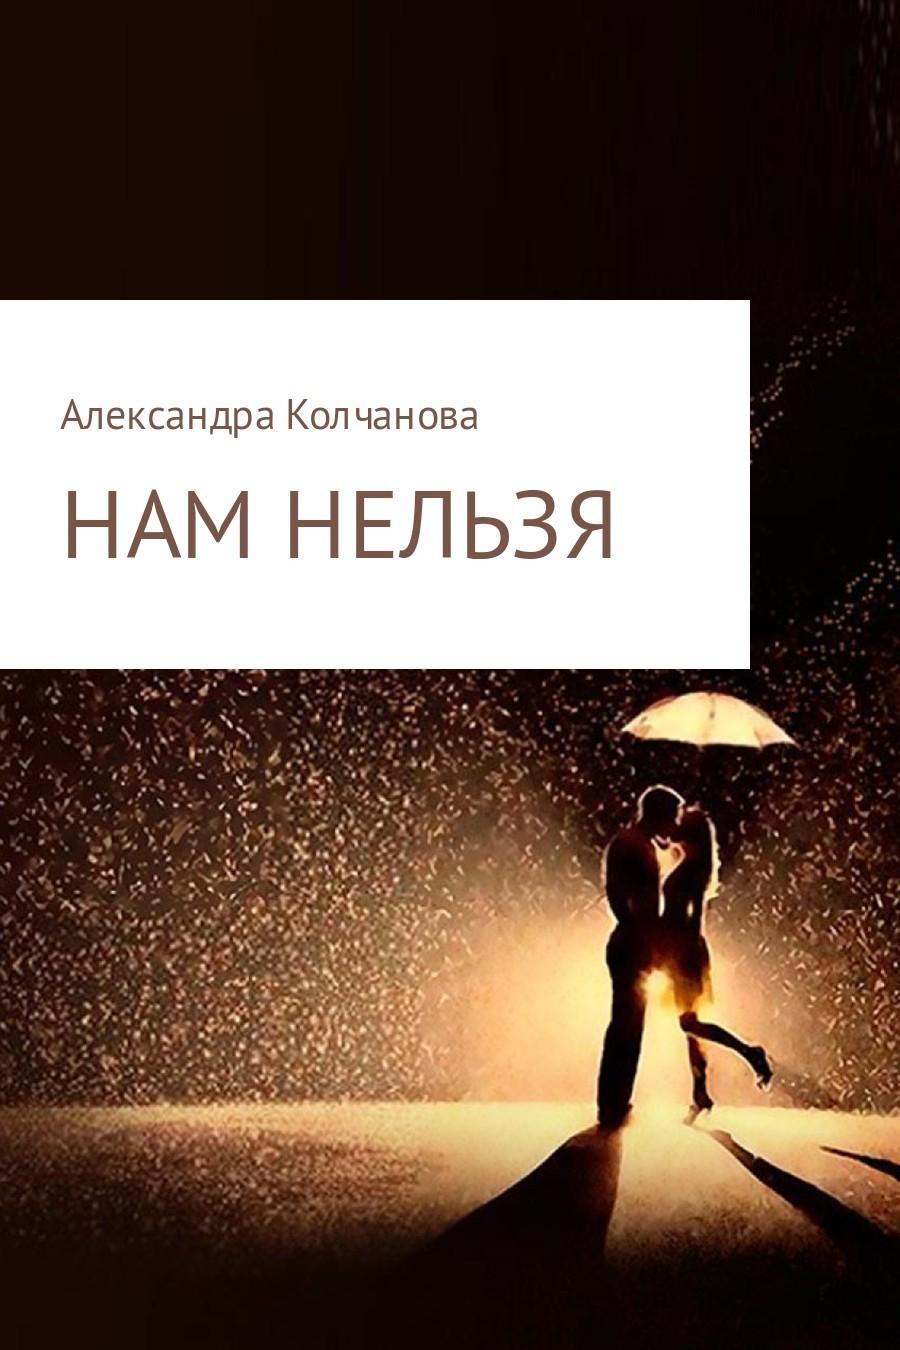 Александра Колчанова - Нам нельзя